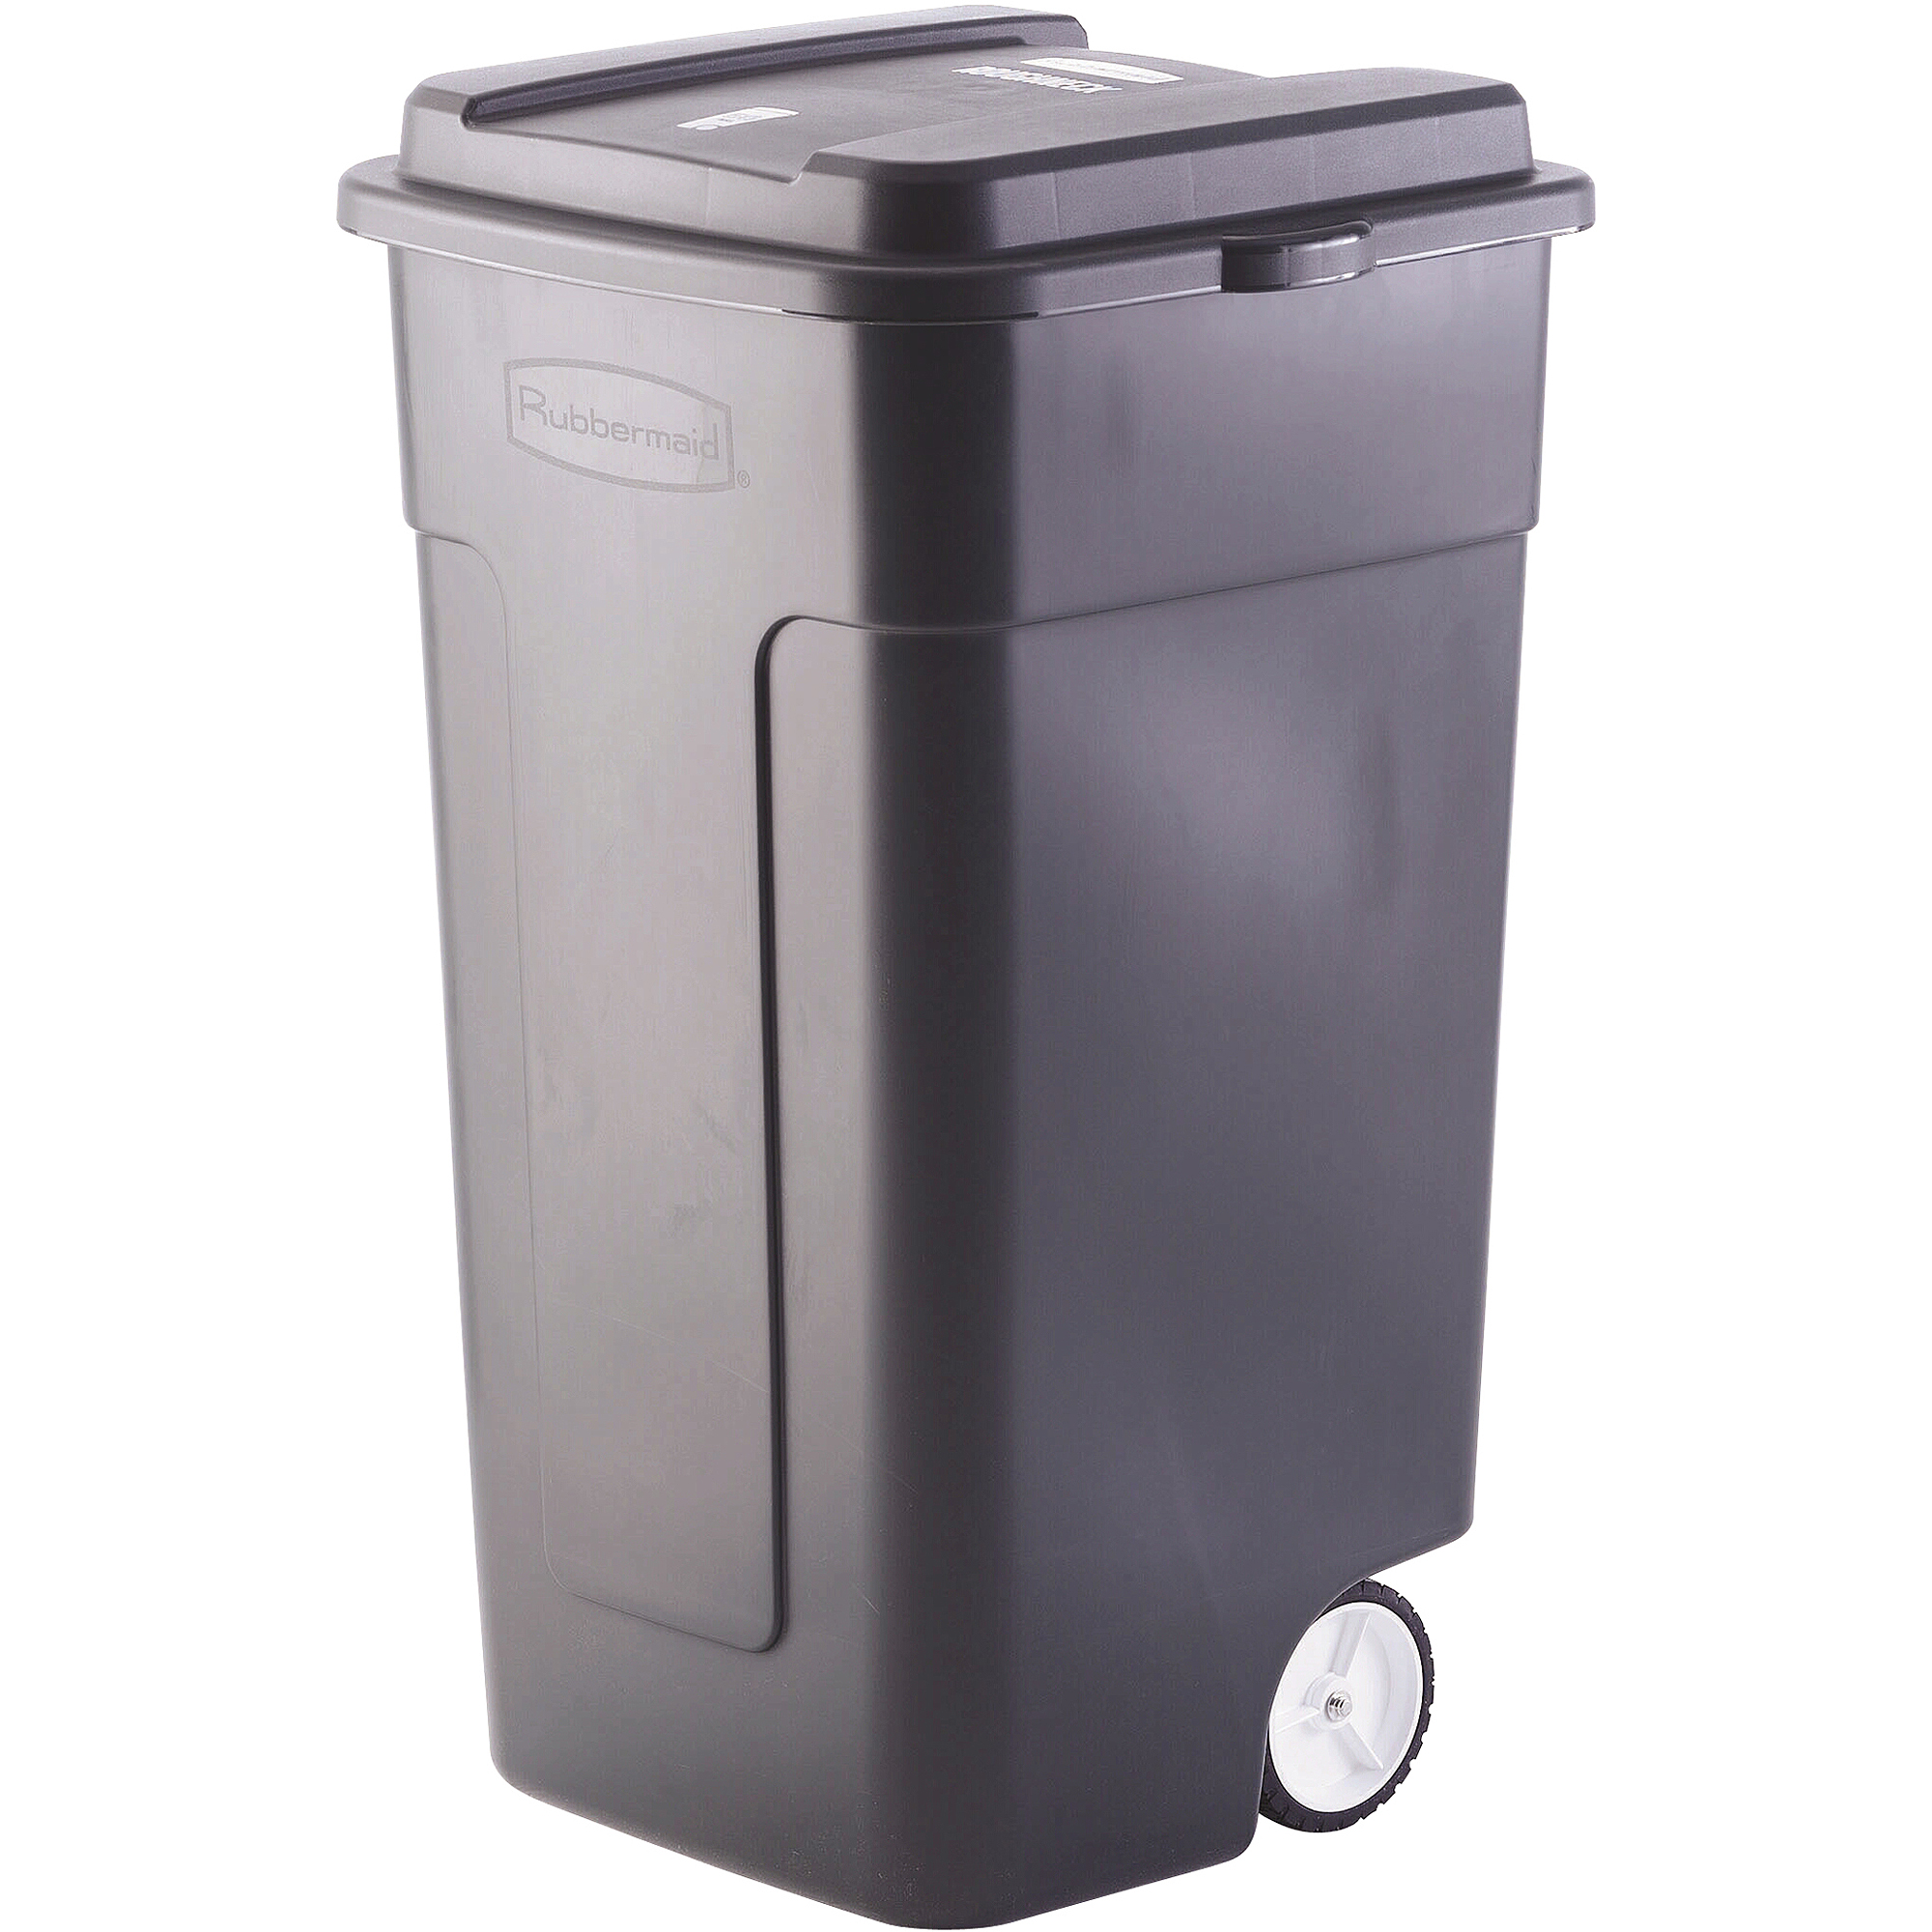 50-Gallon Wheeled Roughneck Trashcan, Black, FG285100BLA